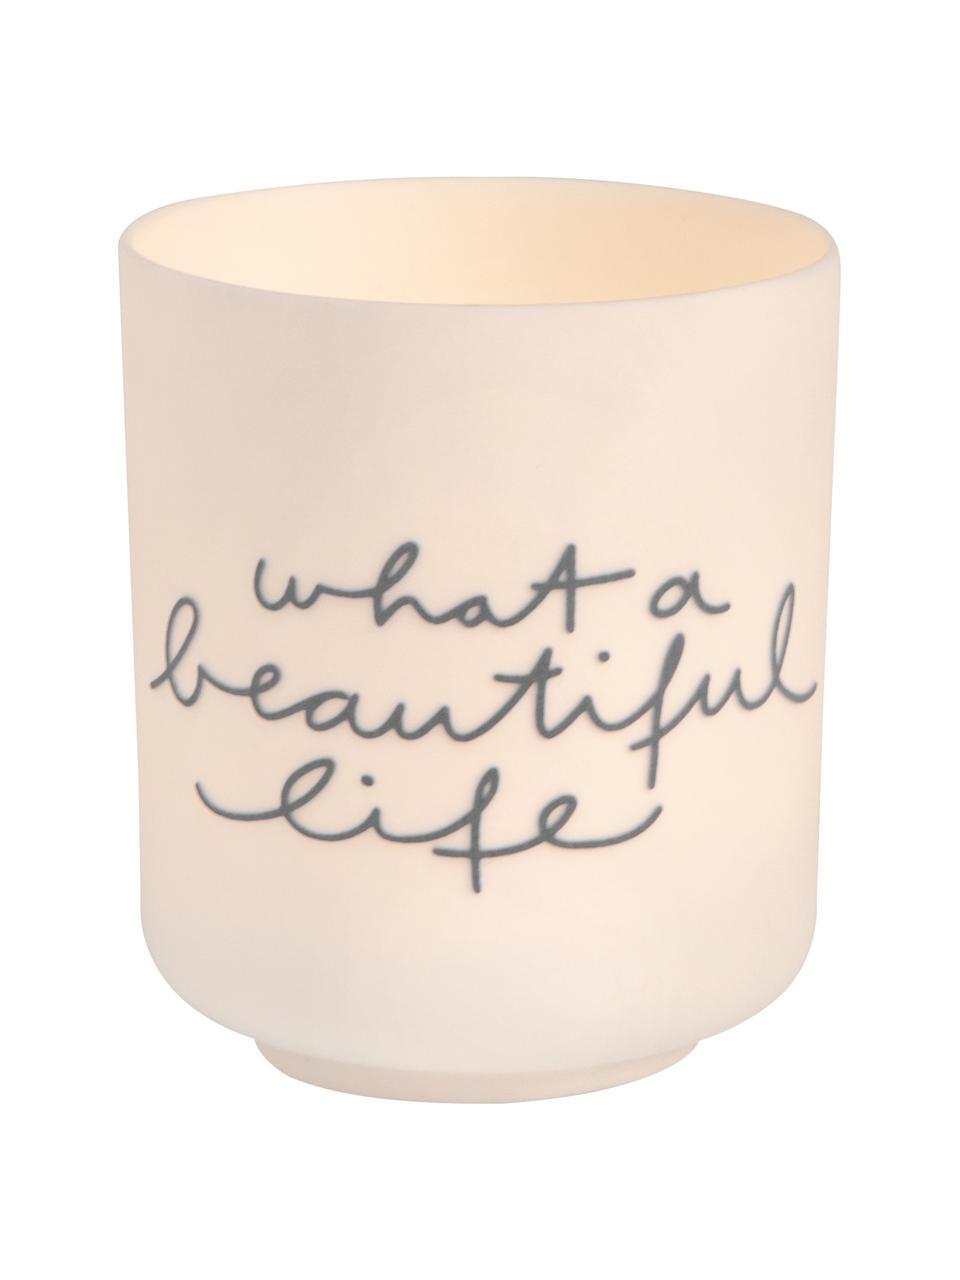 Photophore porcelaine minimaliste Poem, Blanc, bleu